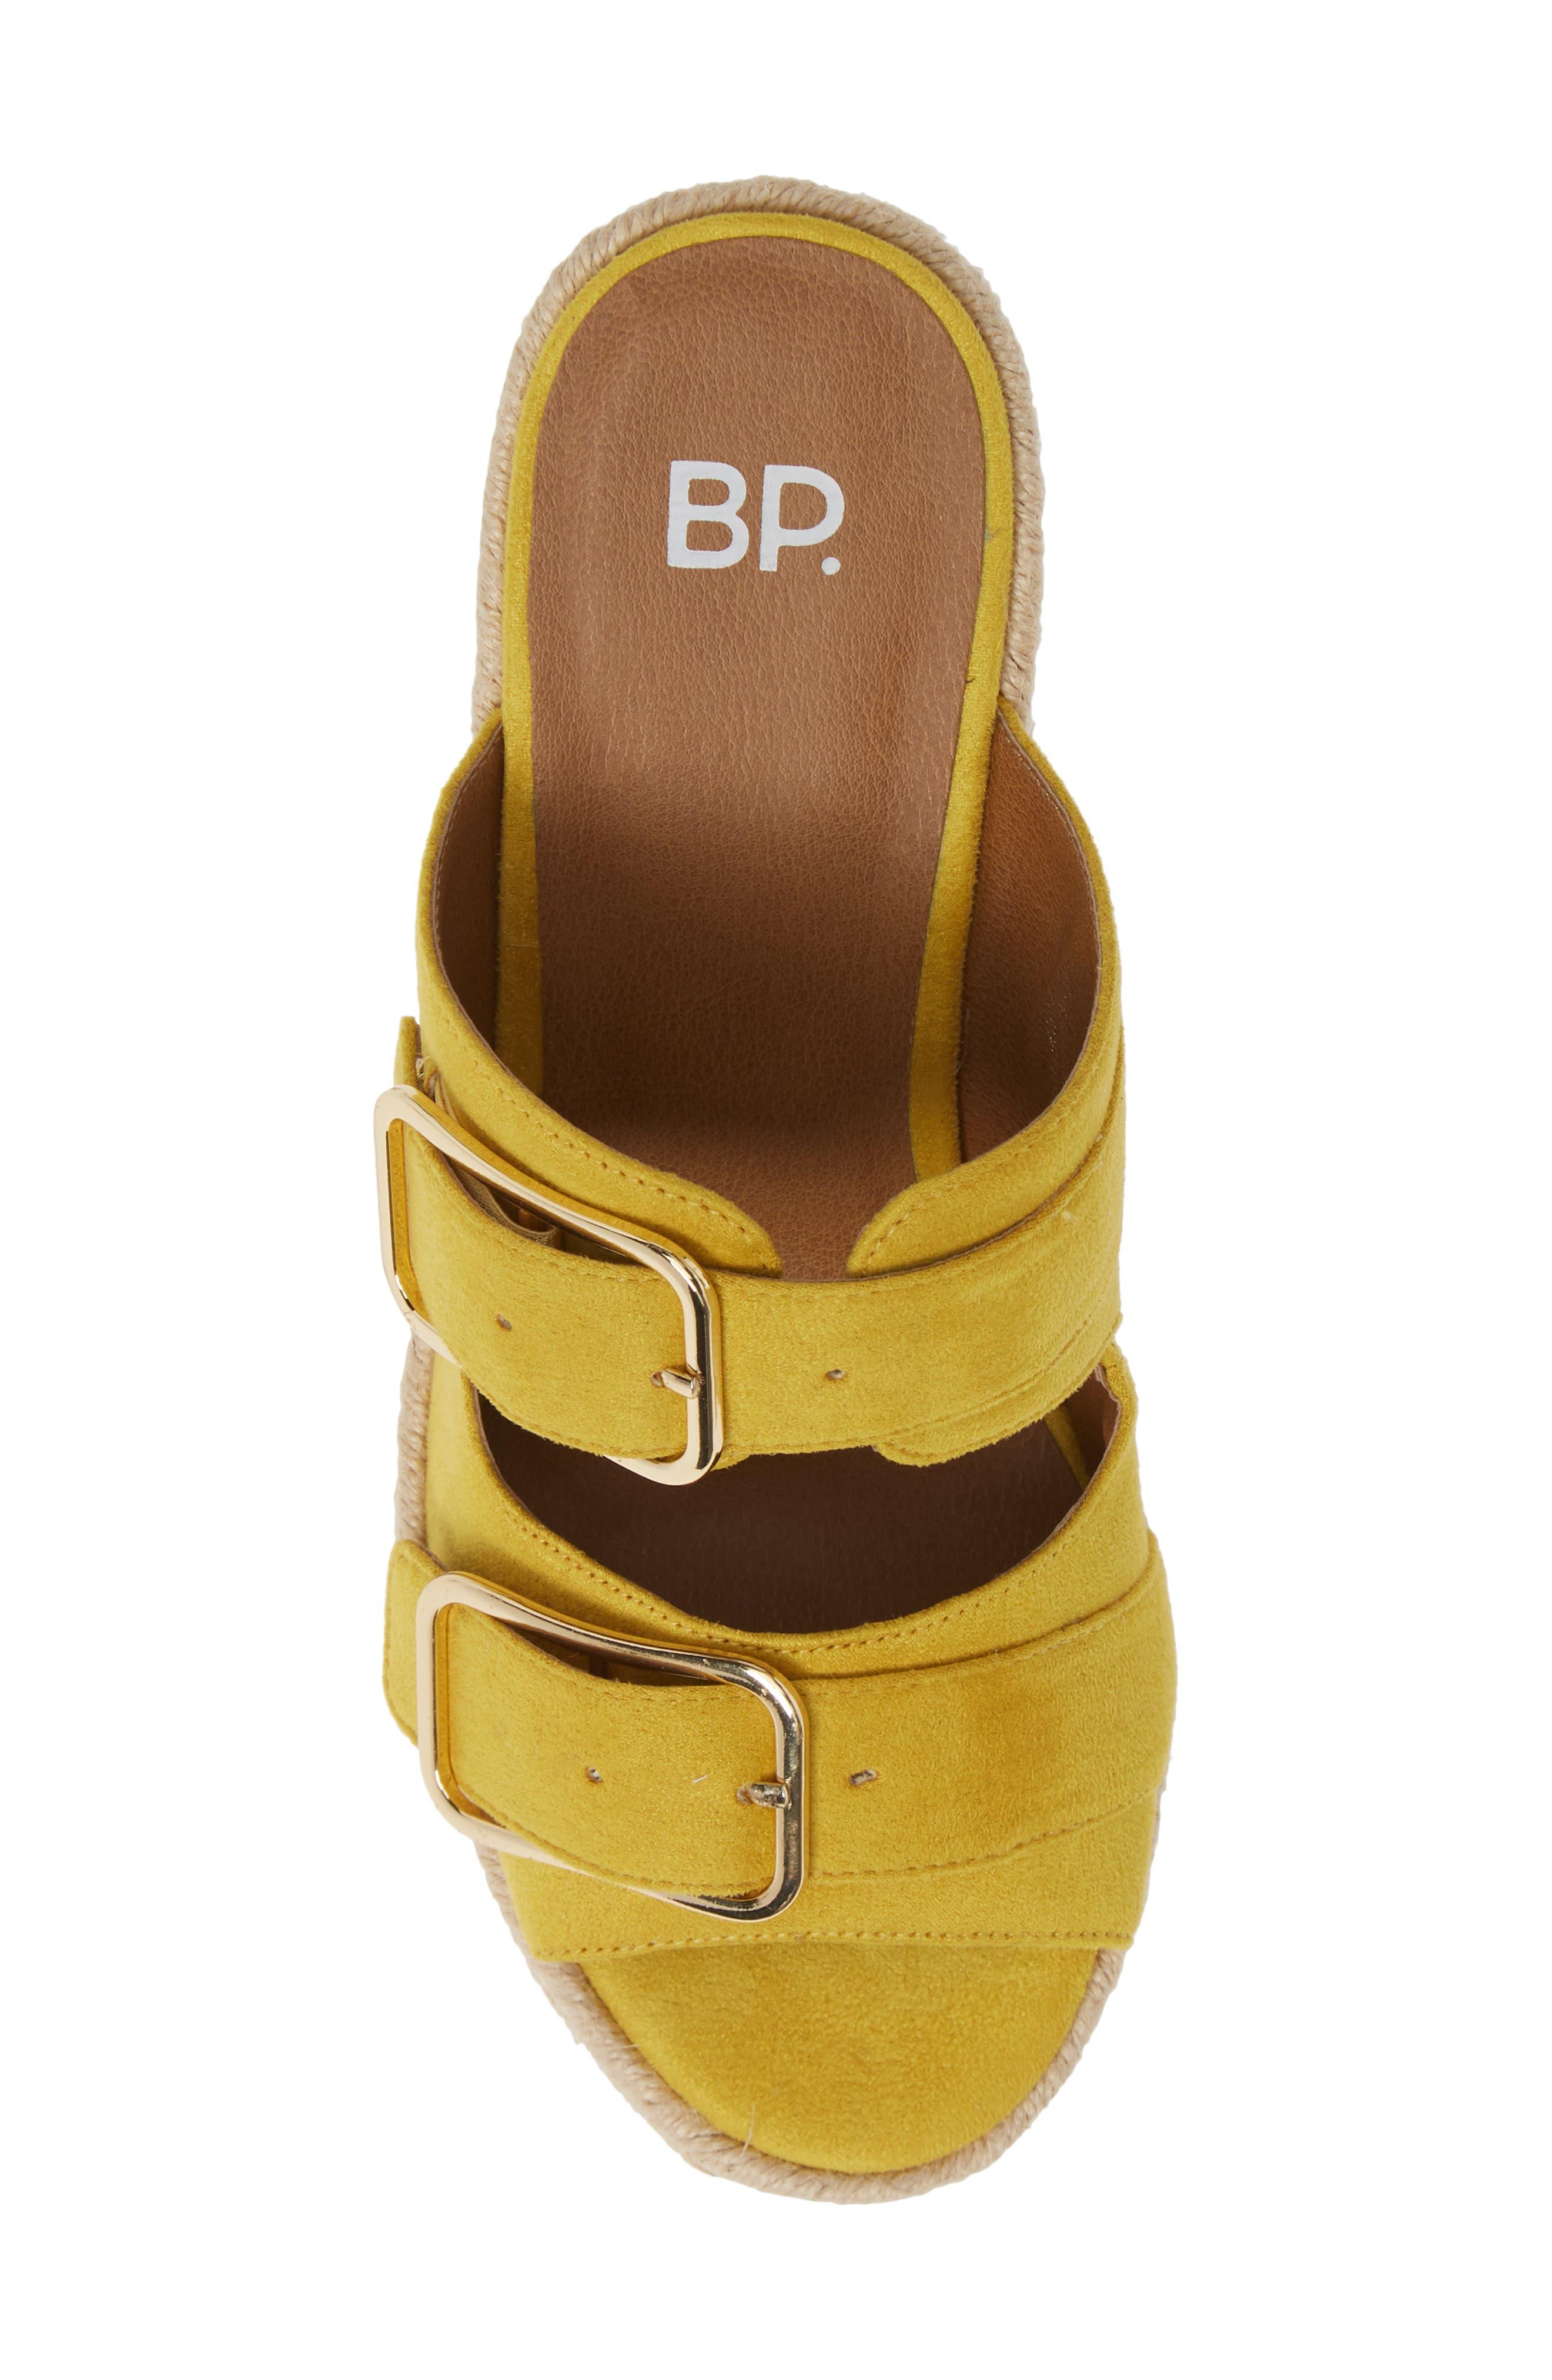 BP., Dani Espadrille Wedge Sandal, Alternate thumbnail 5, color, YELLOW FAUX SUEDE